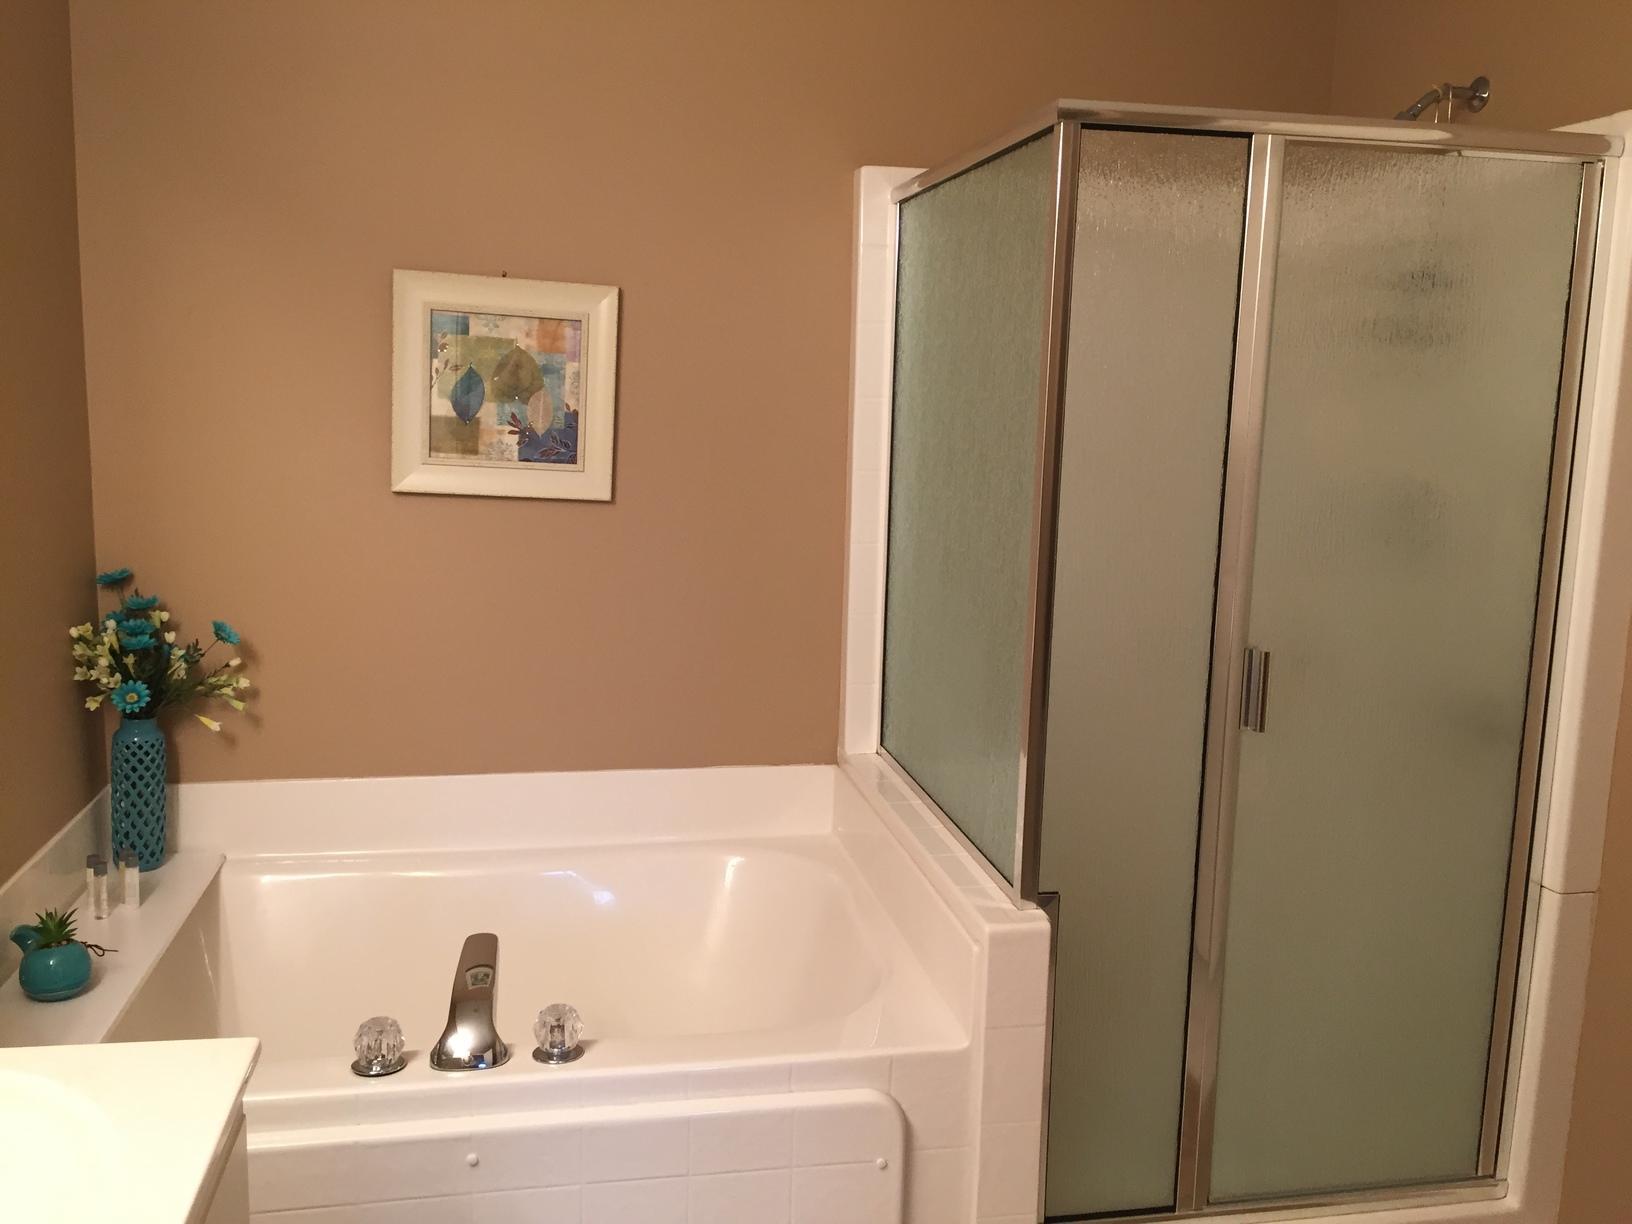 Byron Center Resort Shower - Before Photo